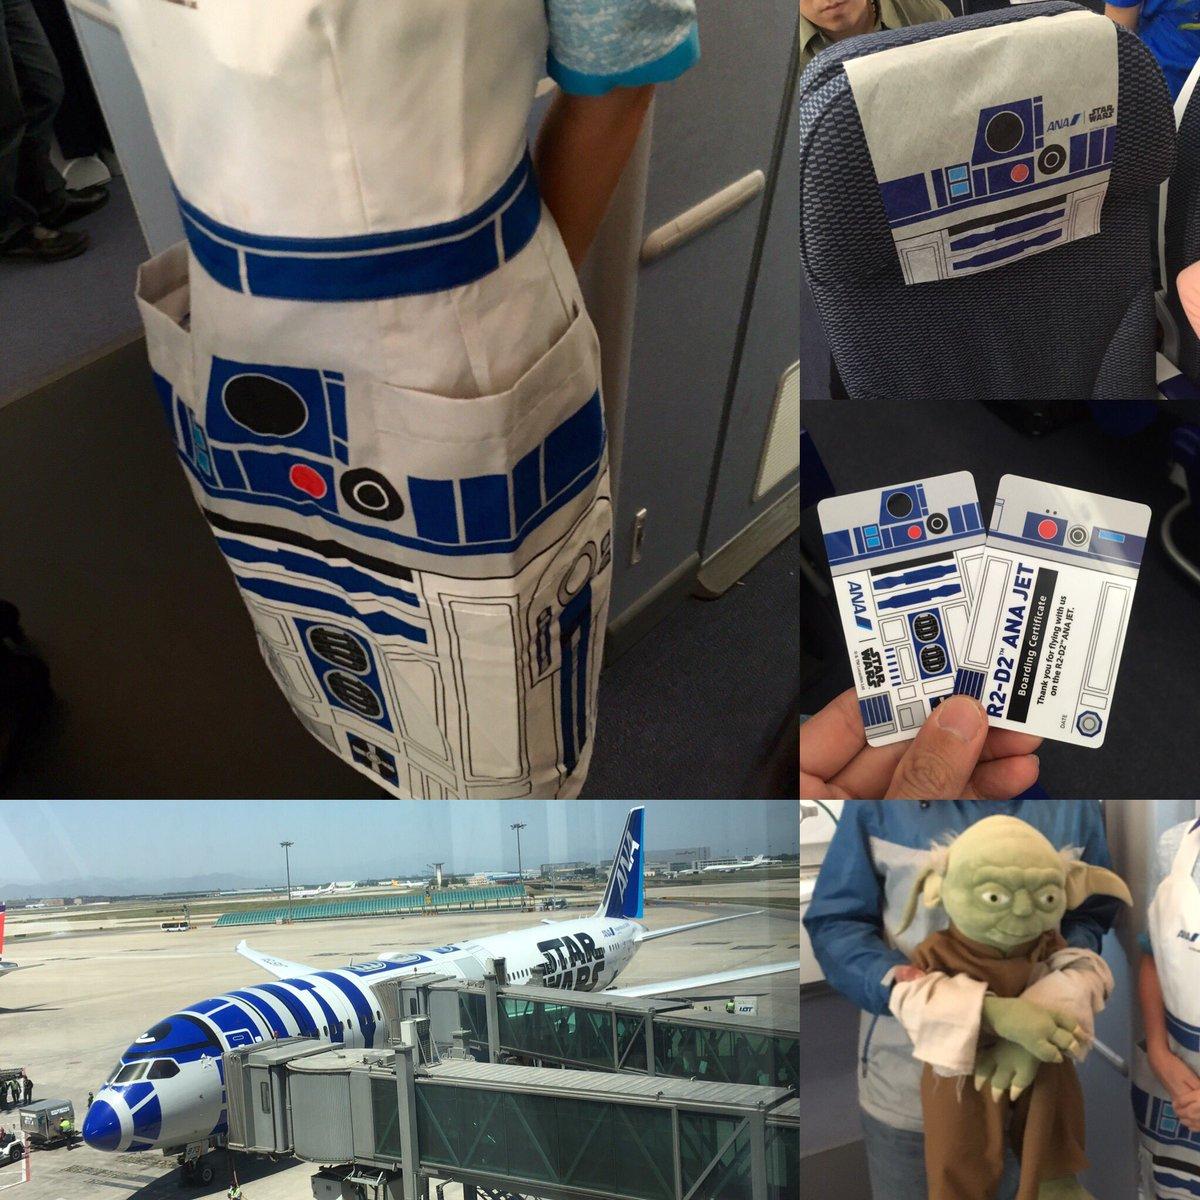 R2-D2 ANAJETに乗れた。 CAさんのエプロンもR2-D2。 https://t.co/hD7w09cjYT